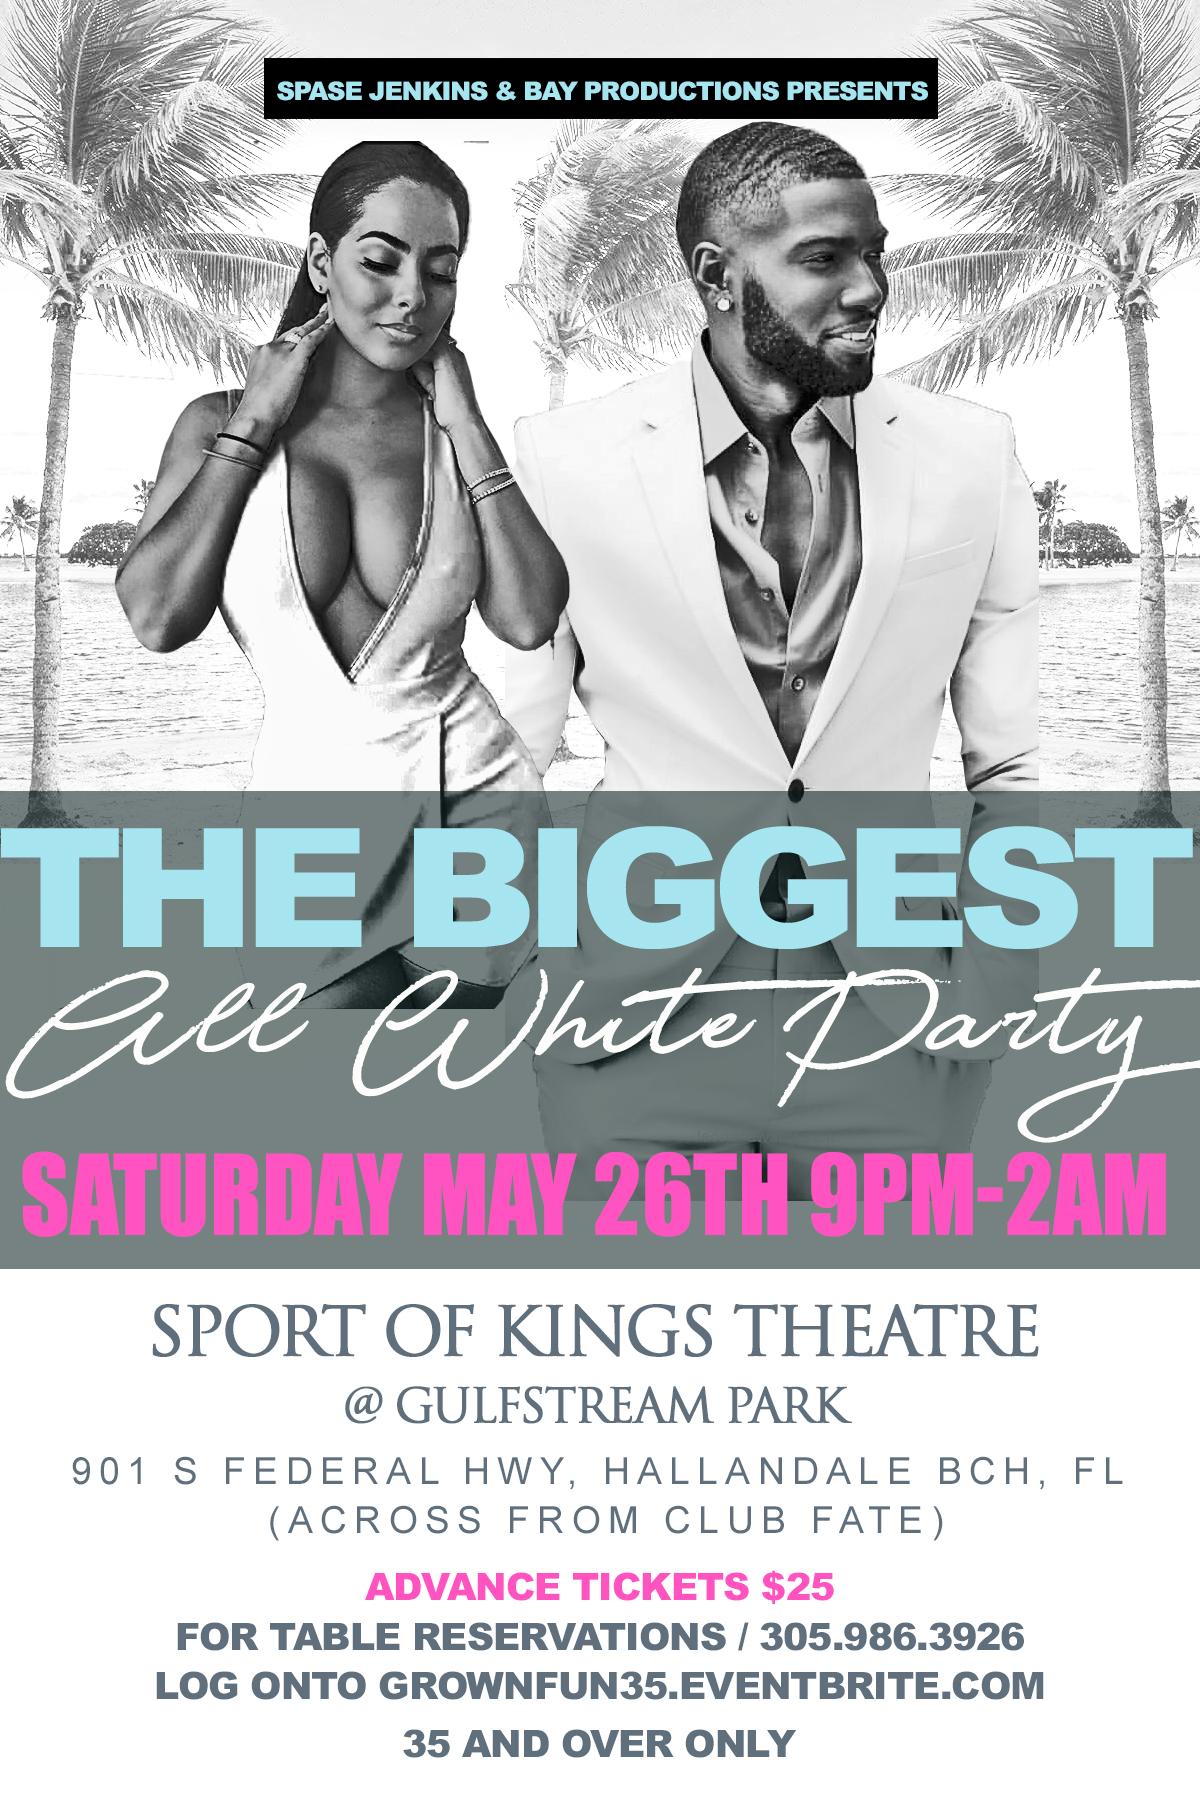 Sat May 26th All White Affair